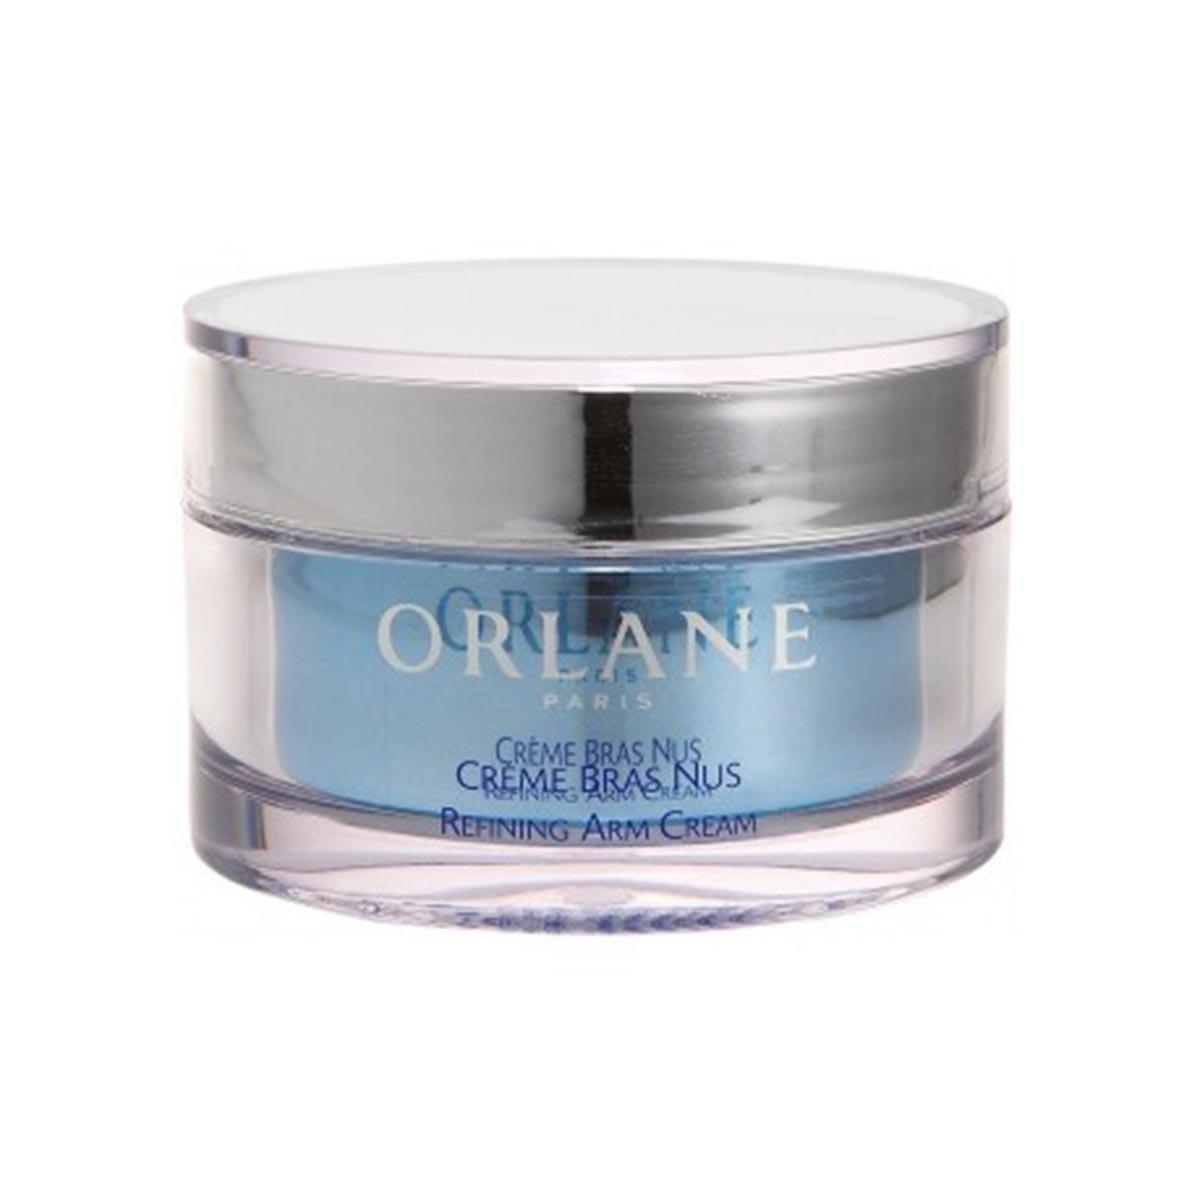 Orlane refining arm crema 50ml